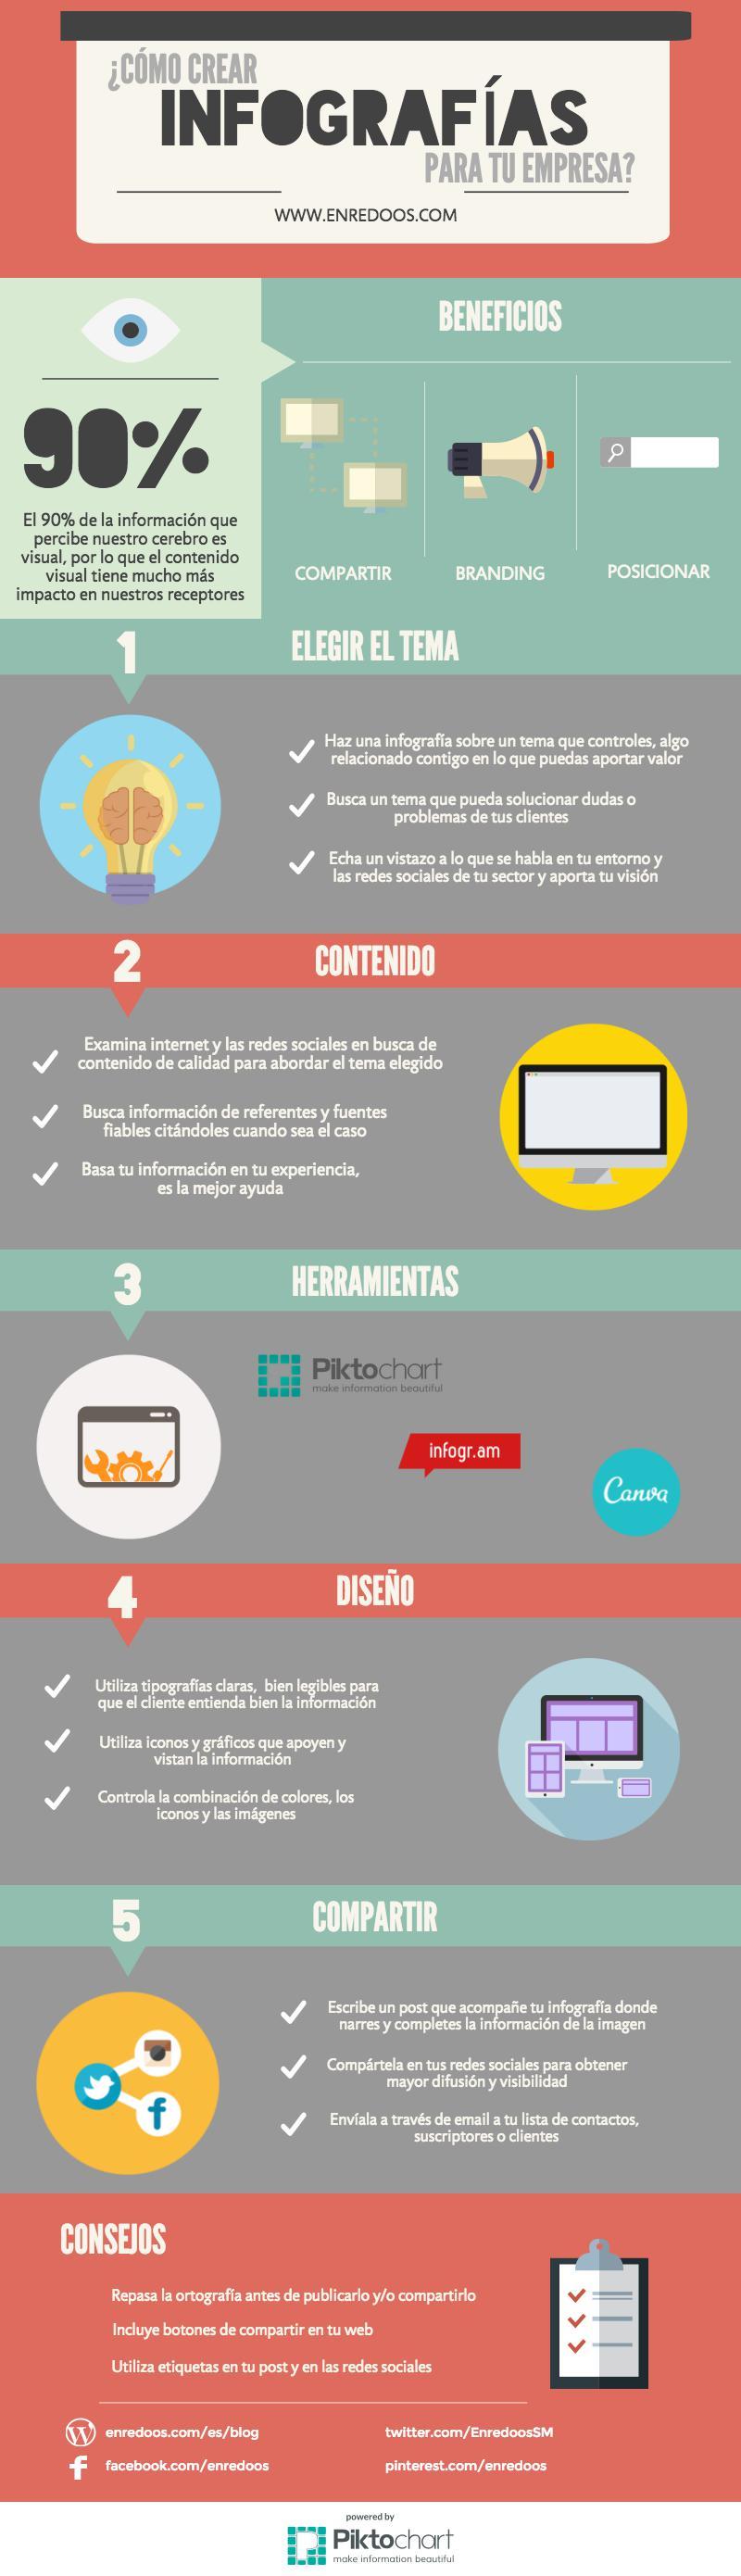 Cómo crear infografías para tu empresa